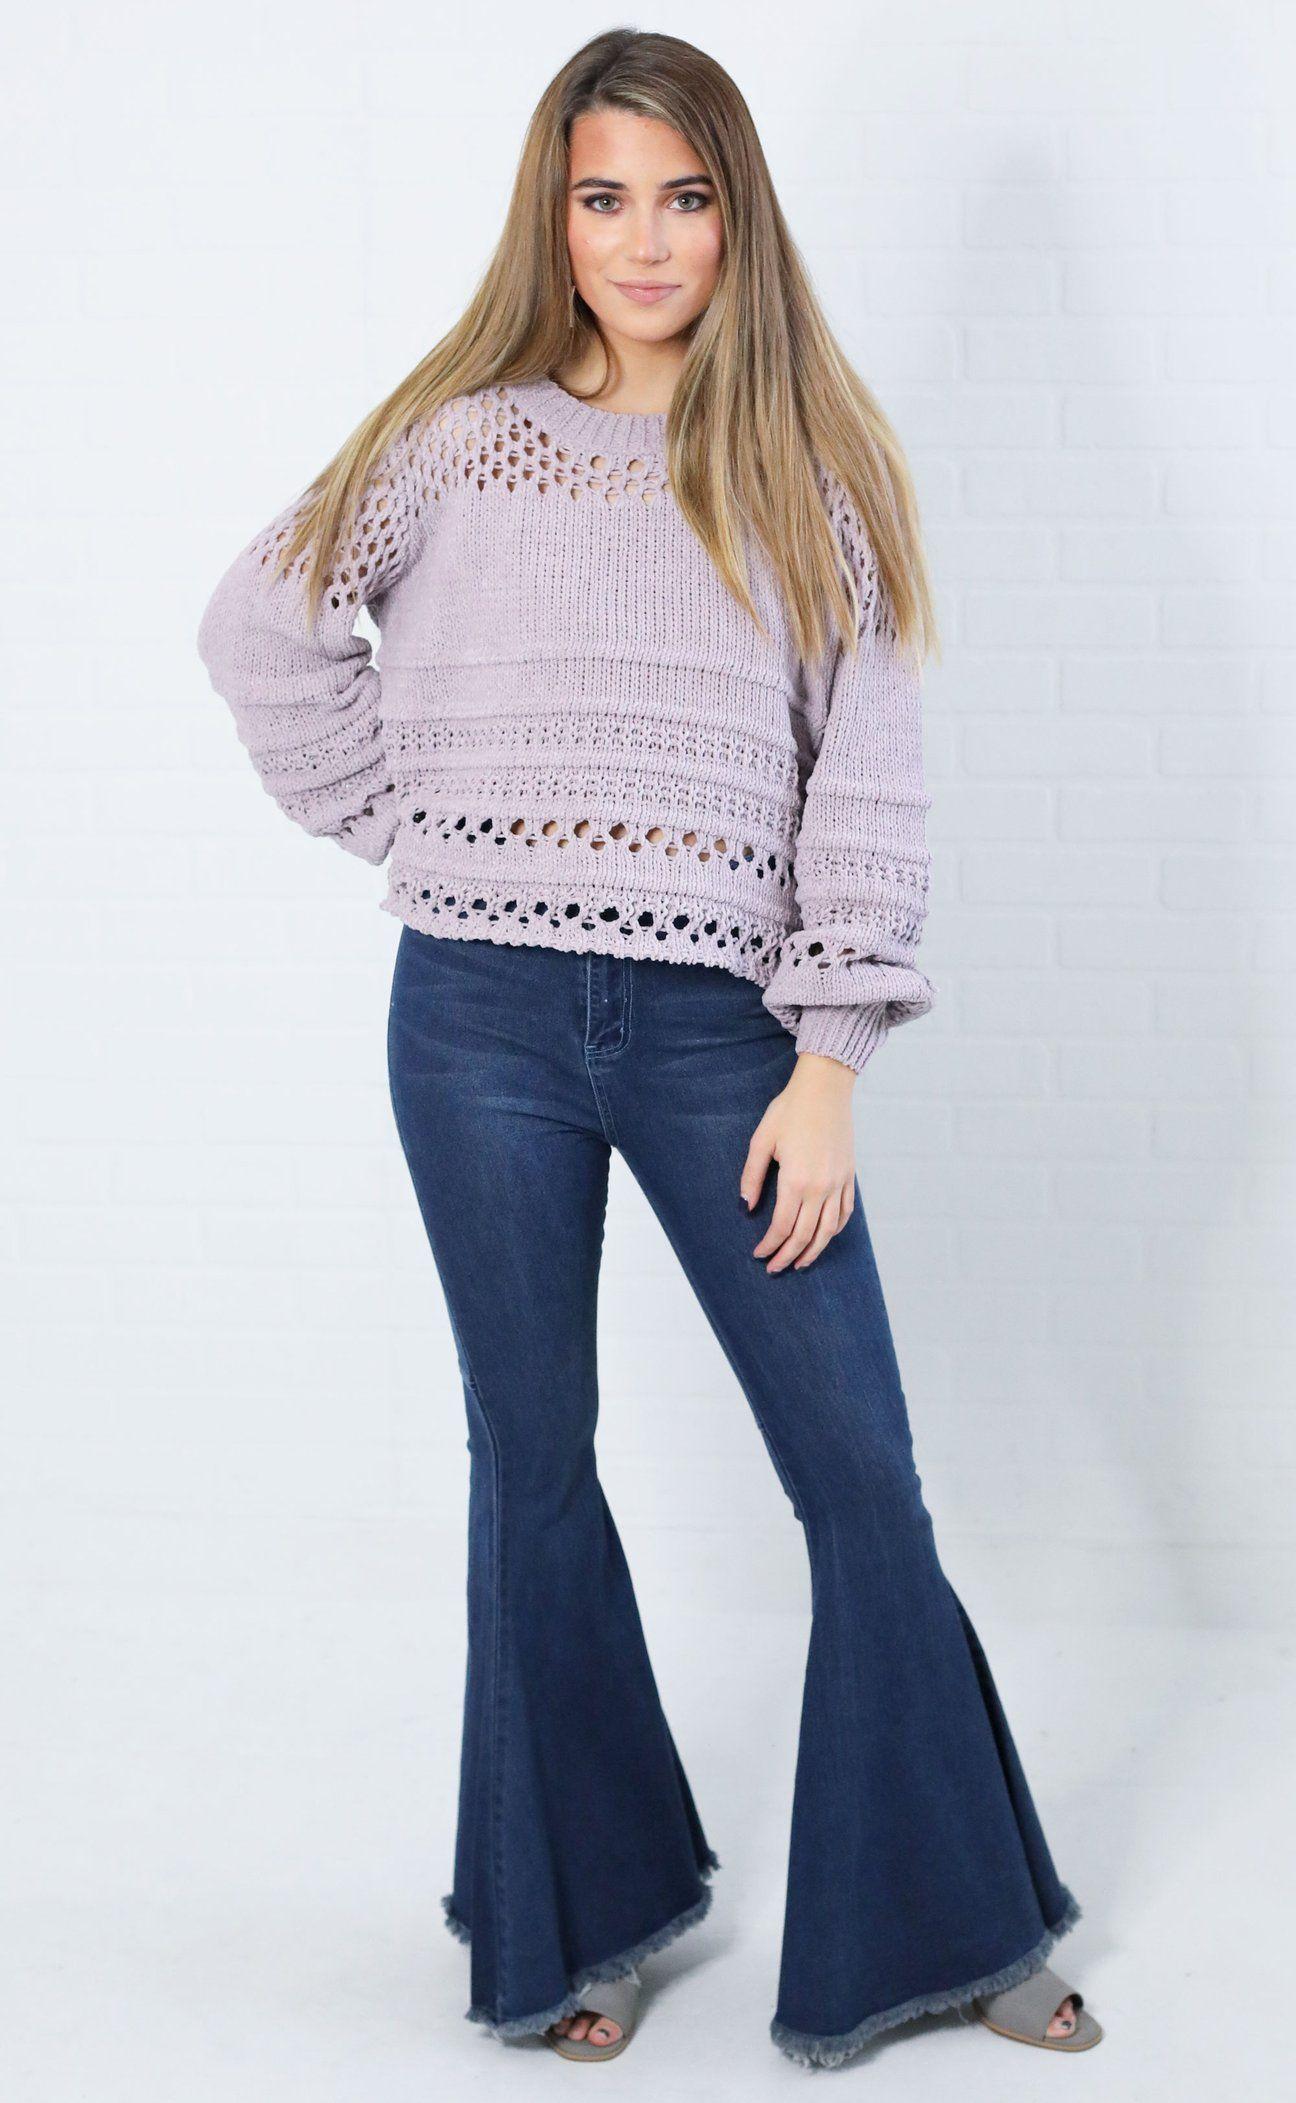 c42e2cca82c22b Ooh la la, the Sarah sweater is simply amaze! Effortlessly unique sums this  one